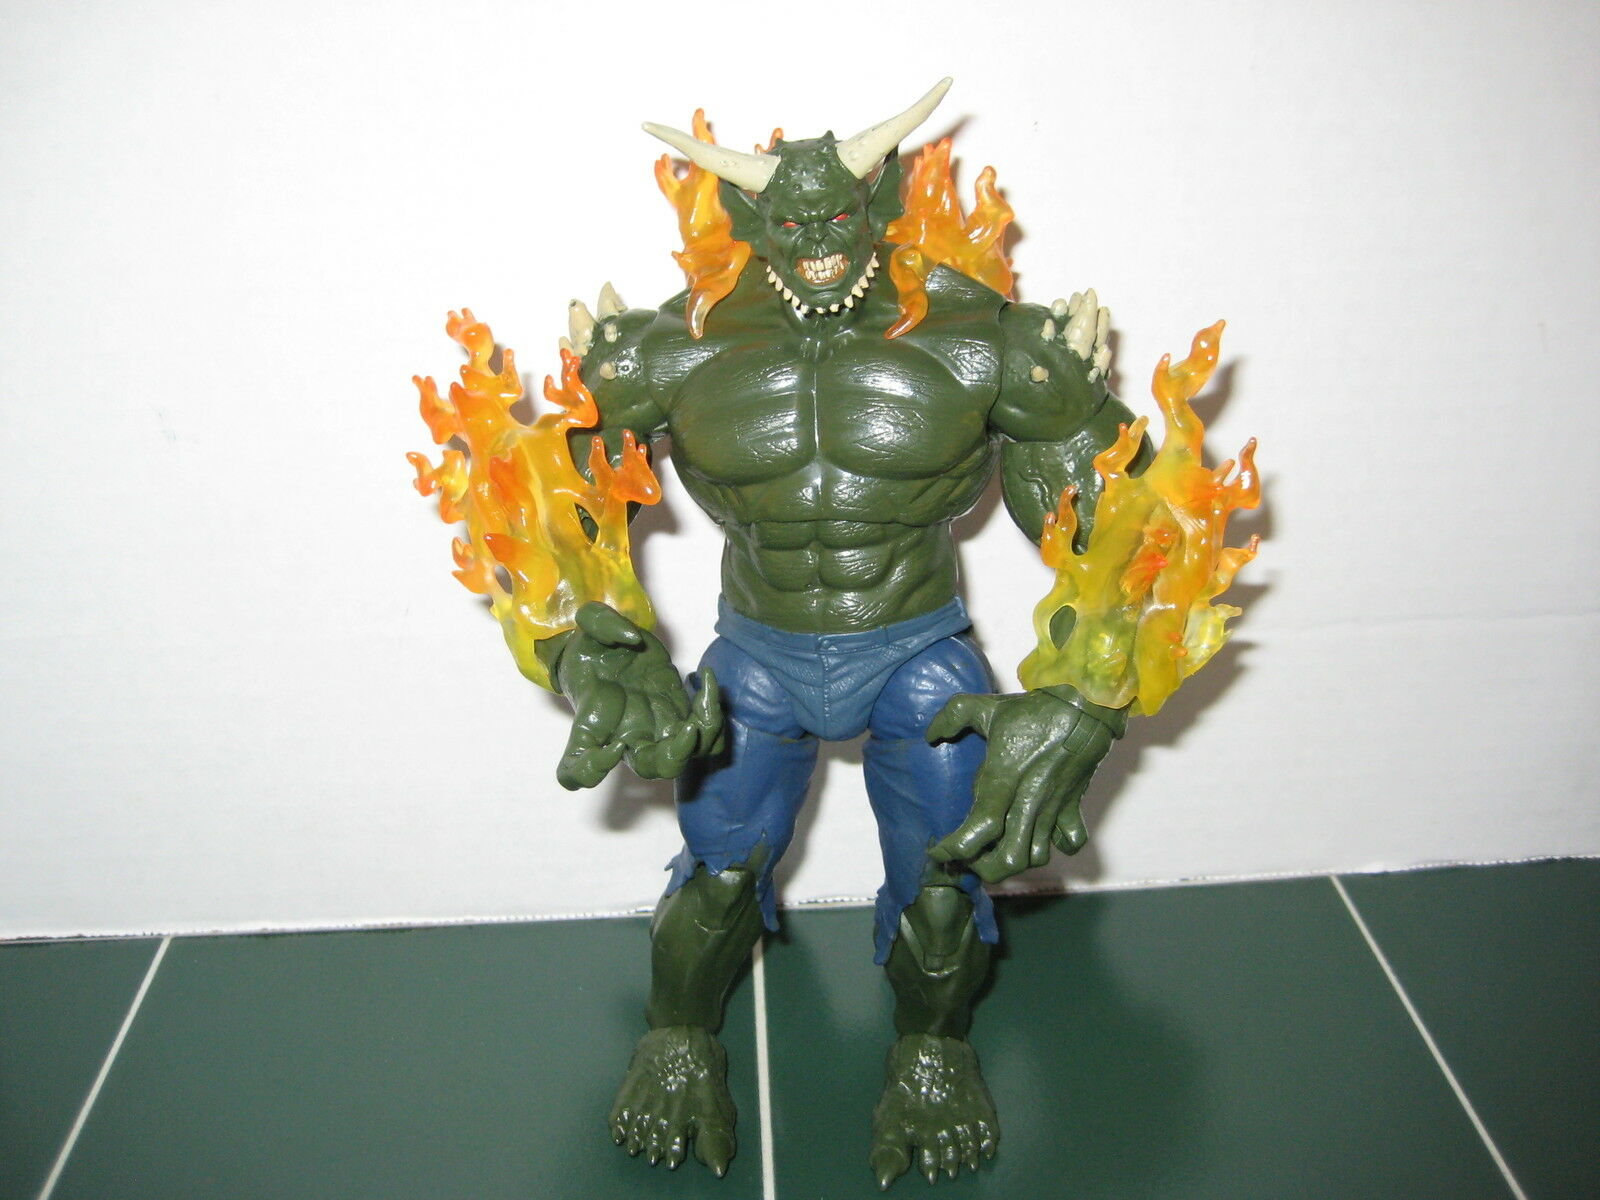 Marvel - legenden baf Grün goblin abbildung Grün goblin - serie  spider - man